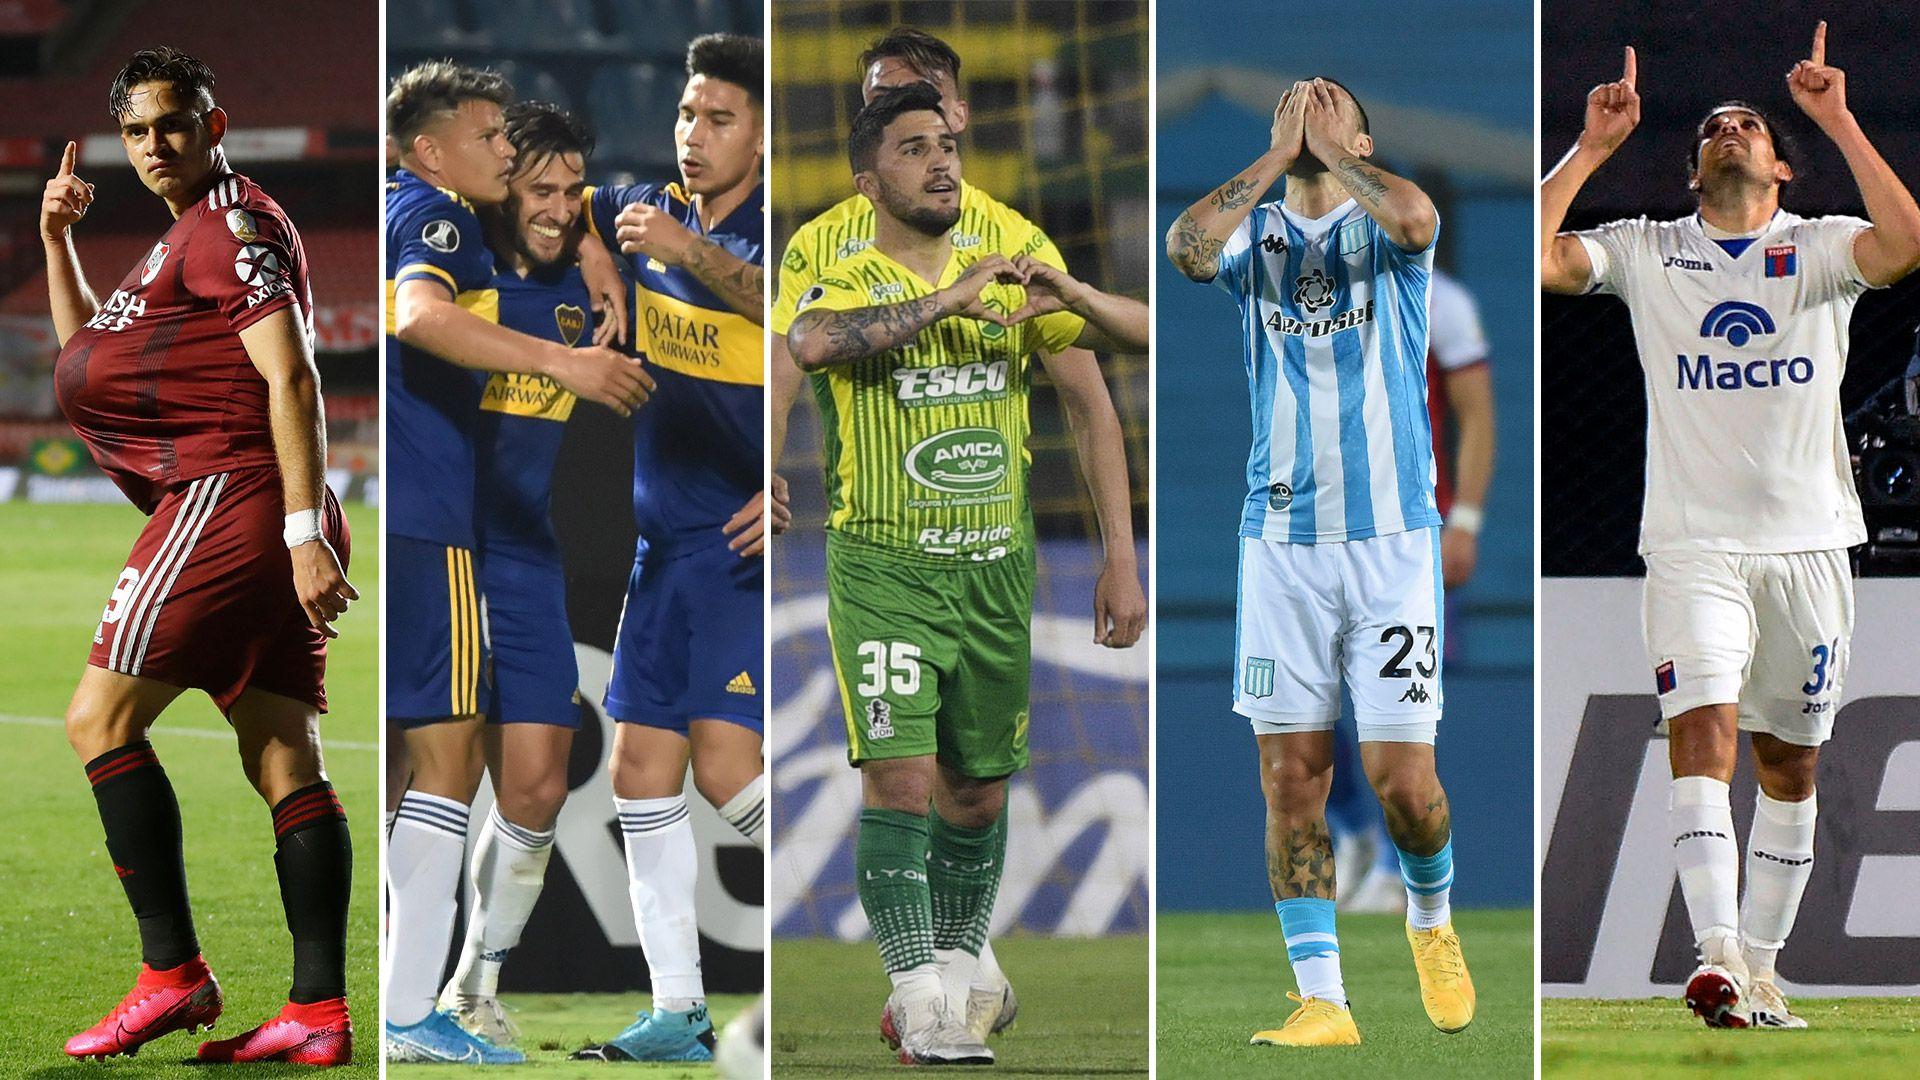 equipos argentinos copa libertadores